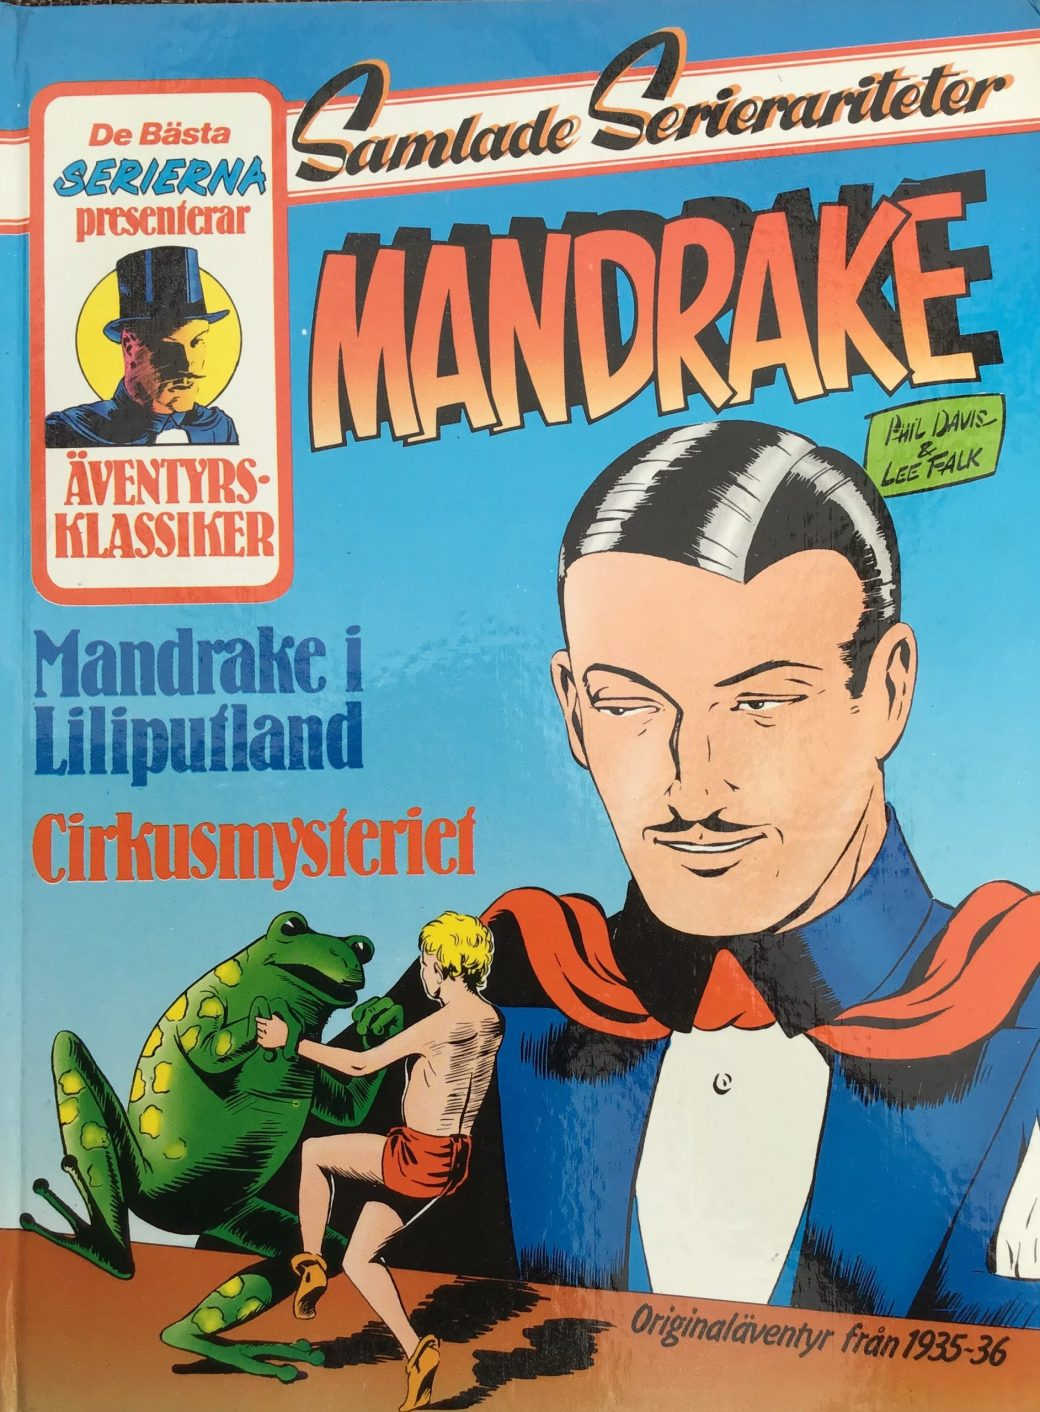 Mandrake (Samlade serierariteter) 1934-36